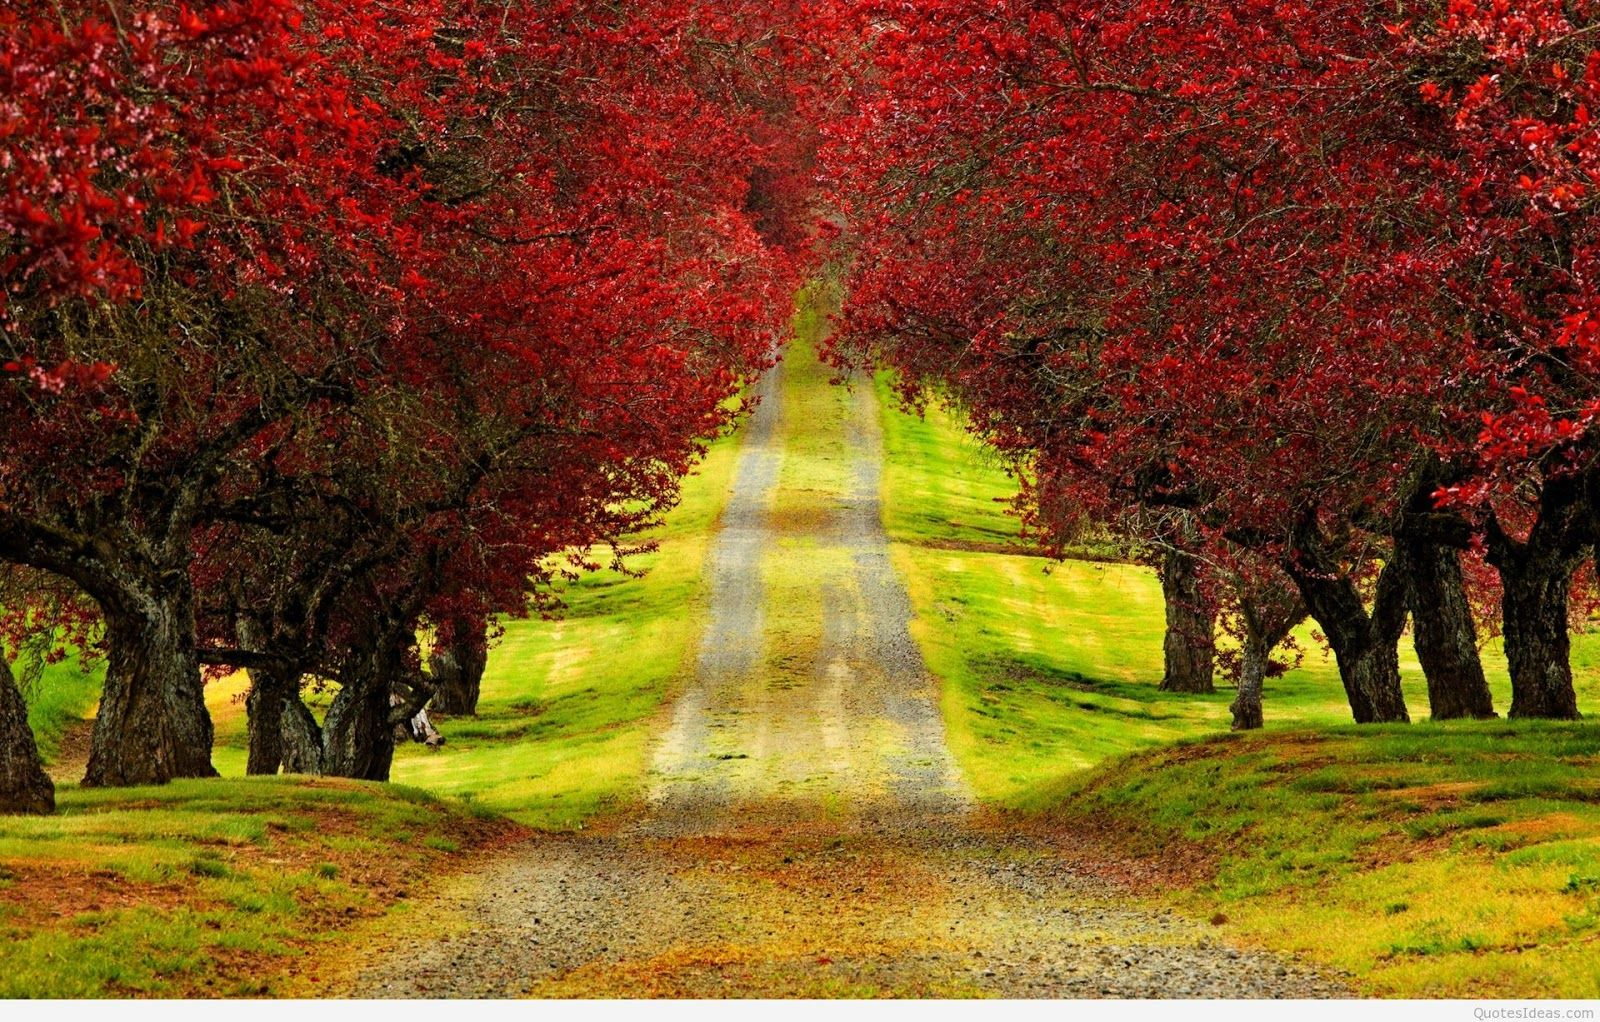 Hd wallpaper nature download - Nature Wallpaper Hd For Desktop Free Download Full Size Full Hd